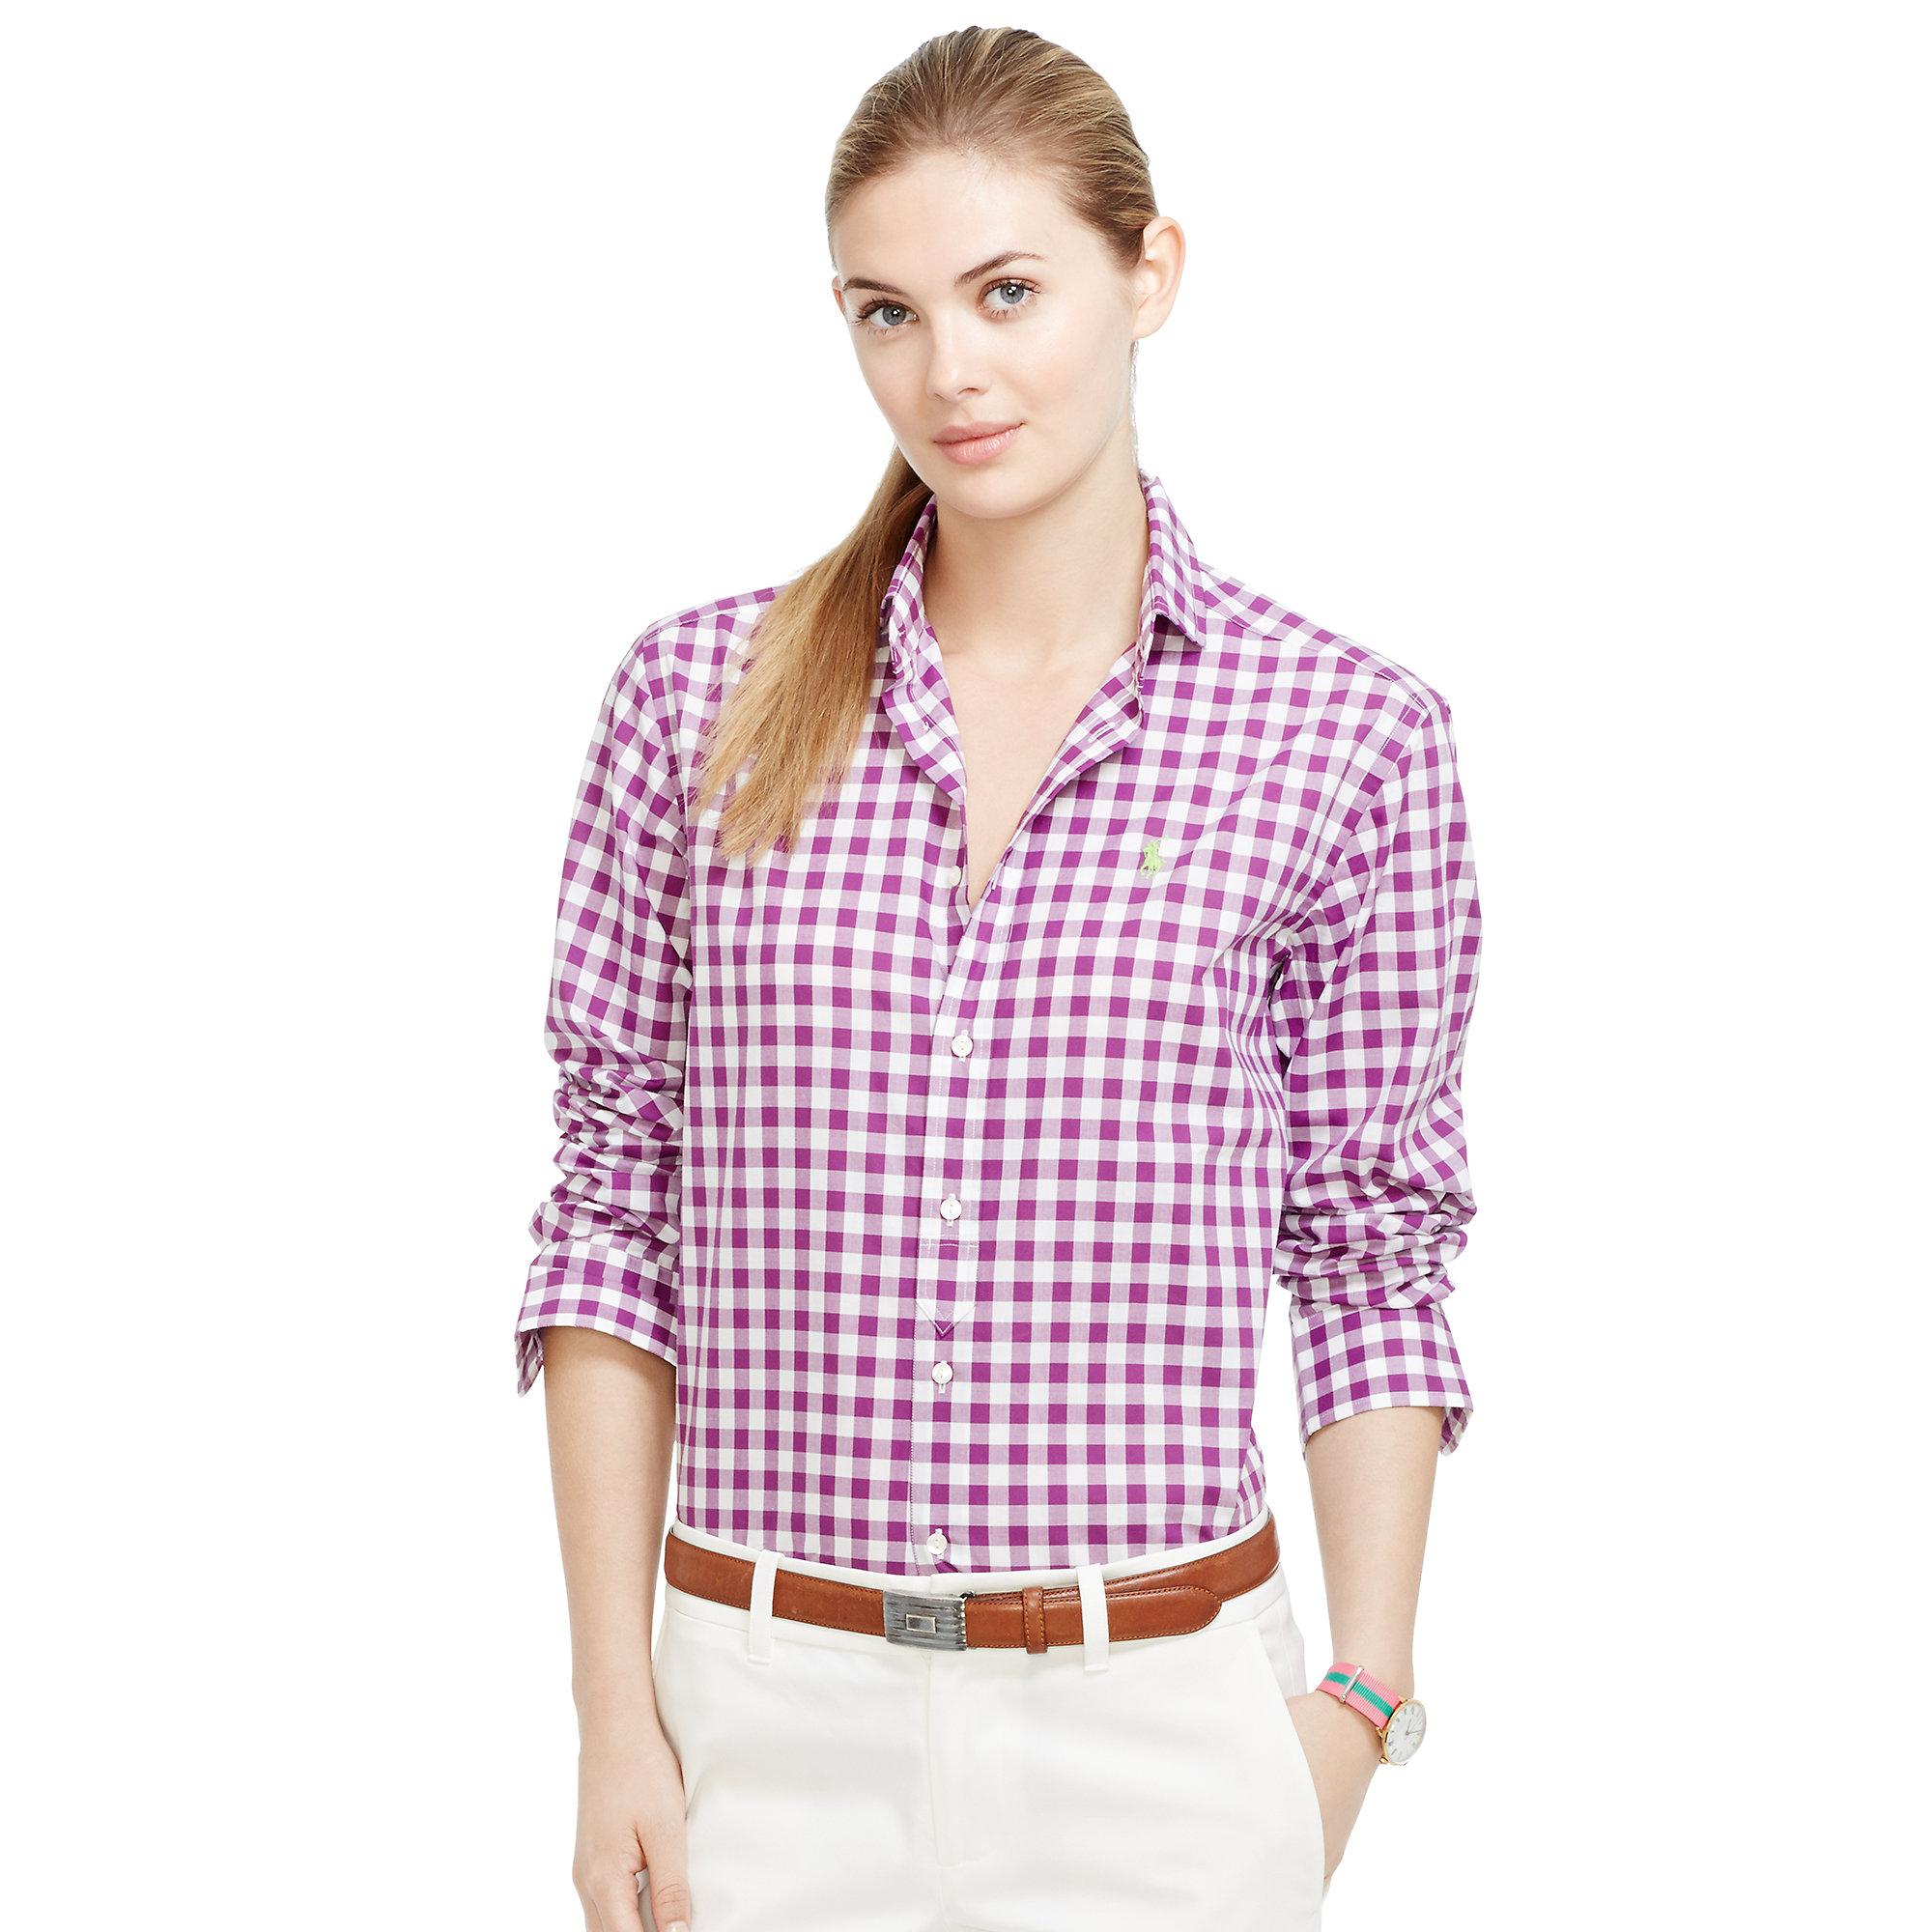 Ralph lauren mesh women short sleeved polo purple for Pink gingham shirt ladies